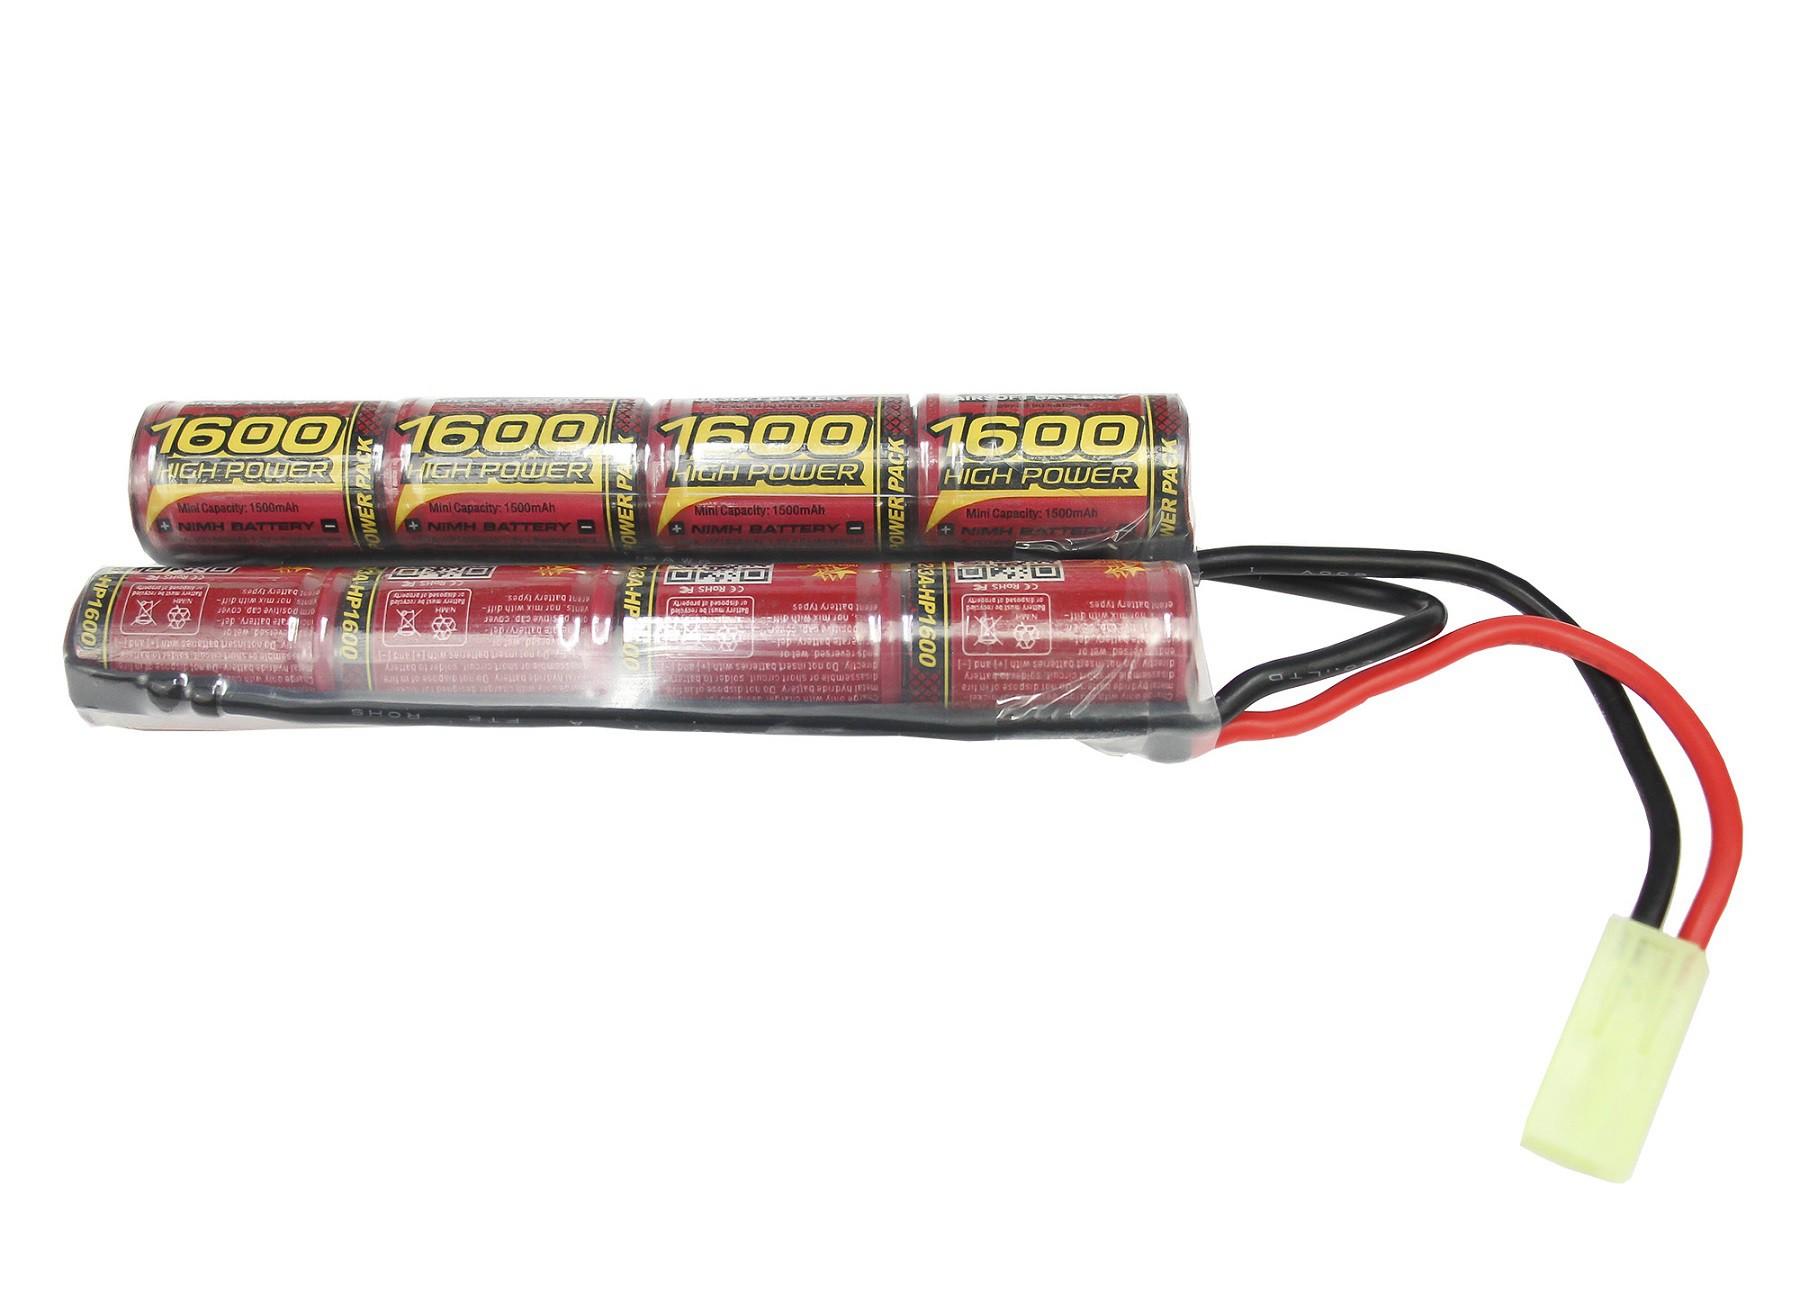 Bateria Para Airsoft Modelo Butterfly 9.6V/1600 mAh (MLT)